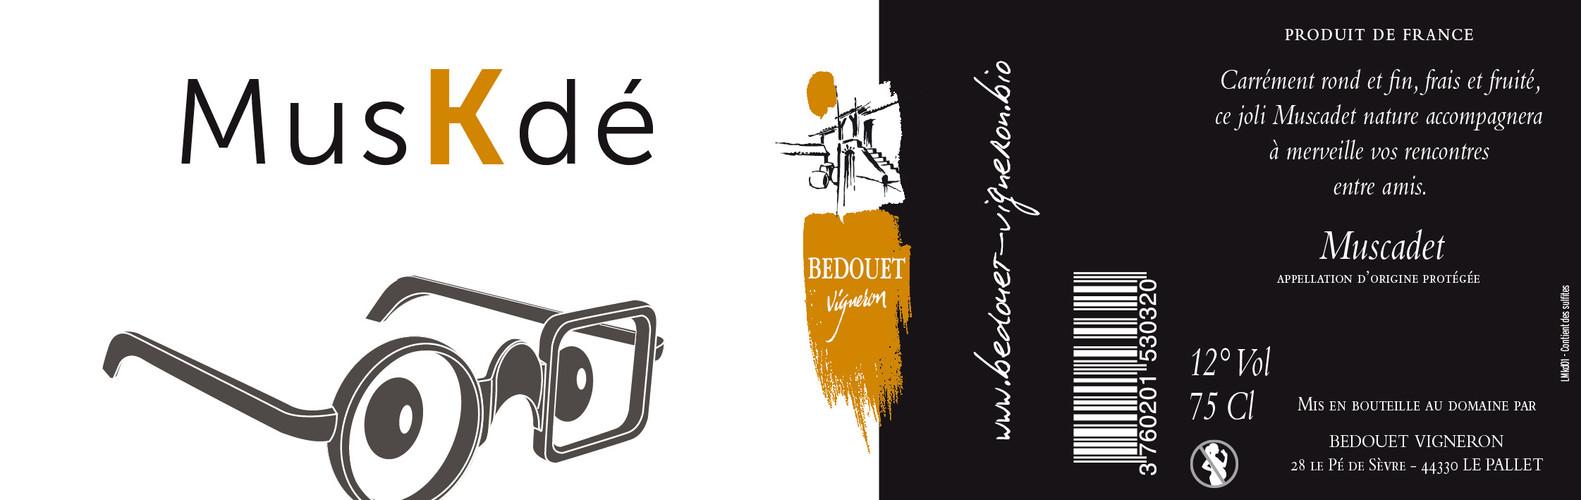 Muskdé Bedouet vigneron BIO